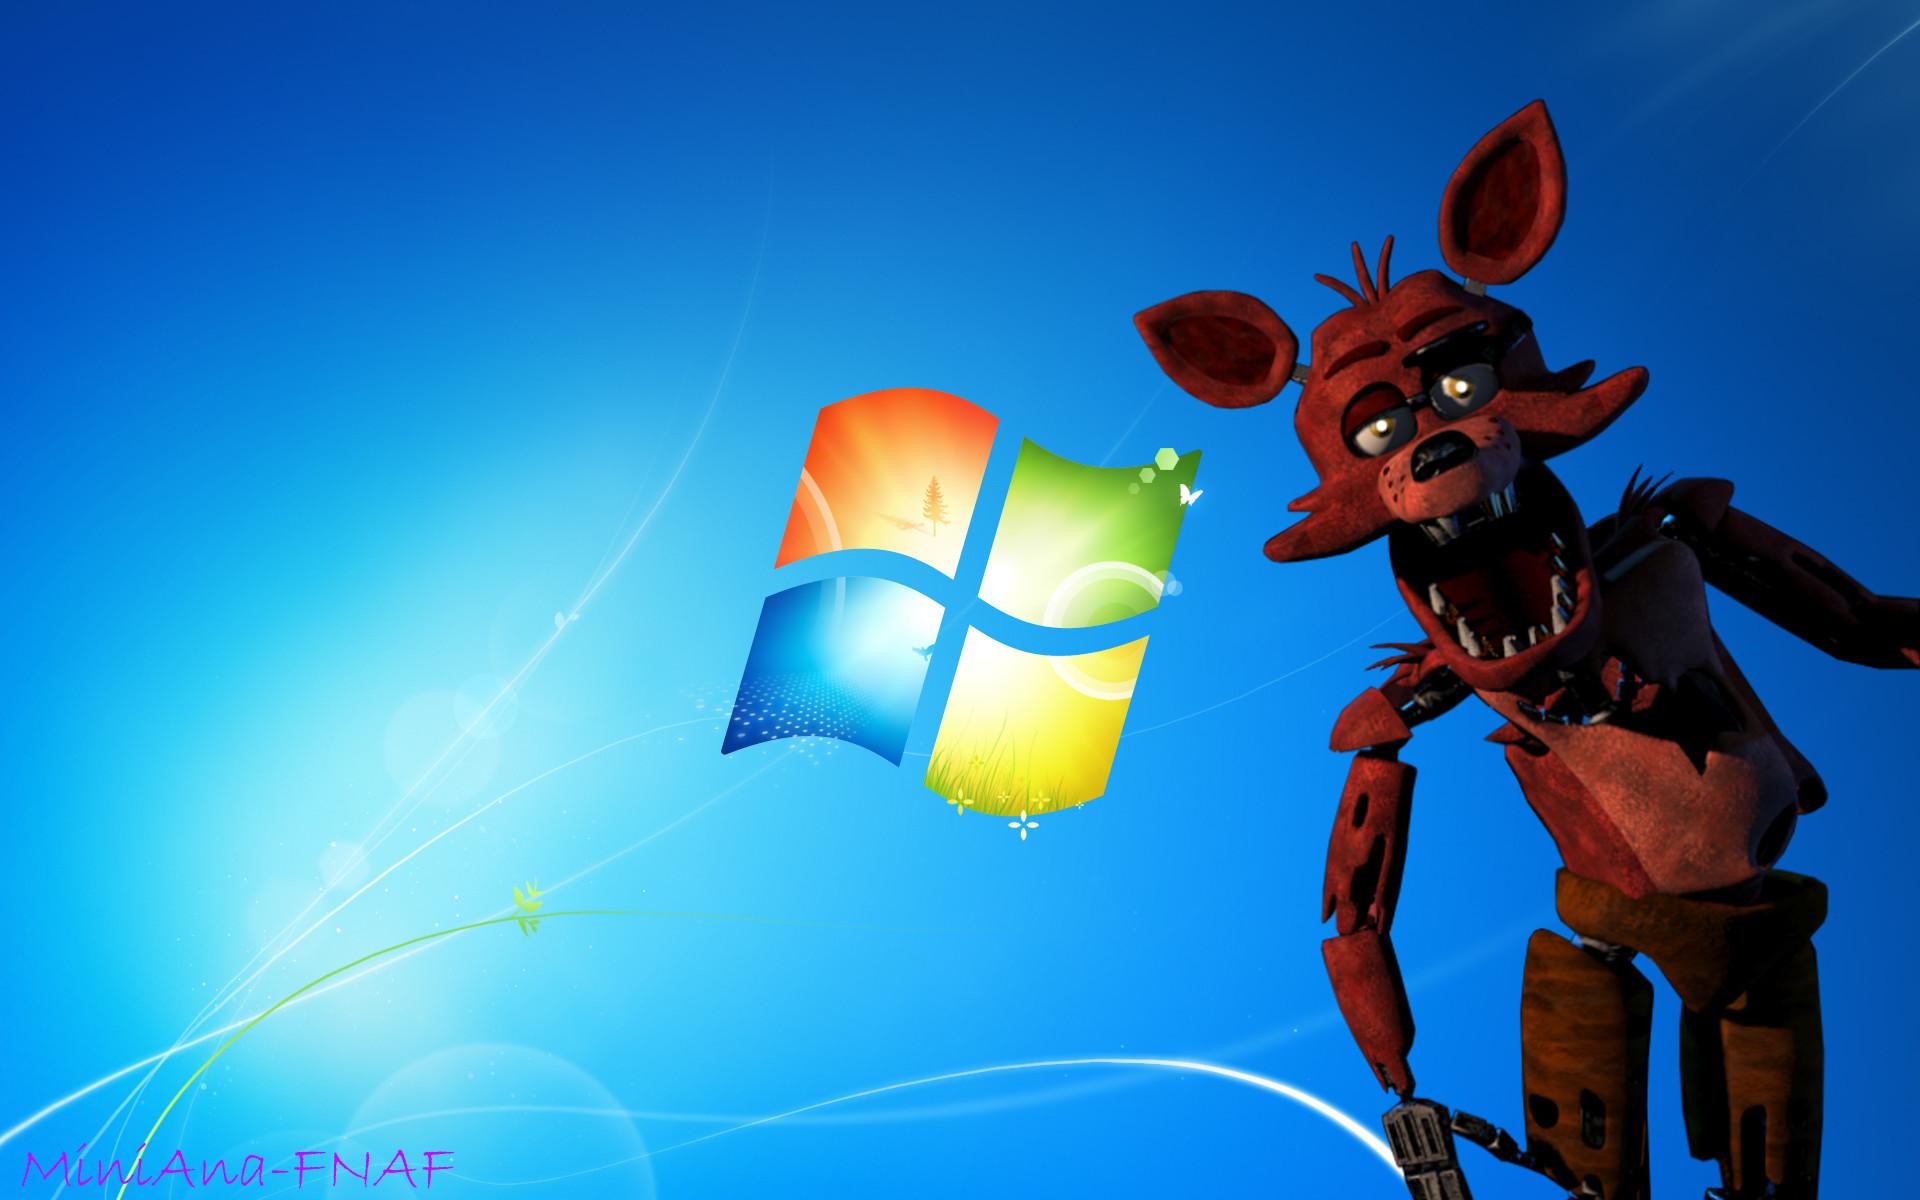 FNAF WALLPAER-Foxy the fox Windows 7 by MiniAna-Fnaf on DeviantArt